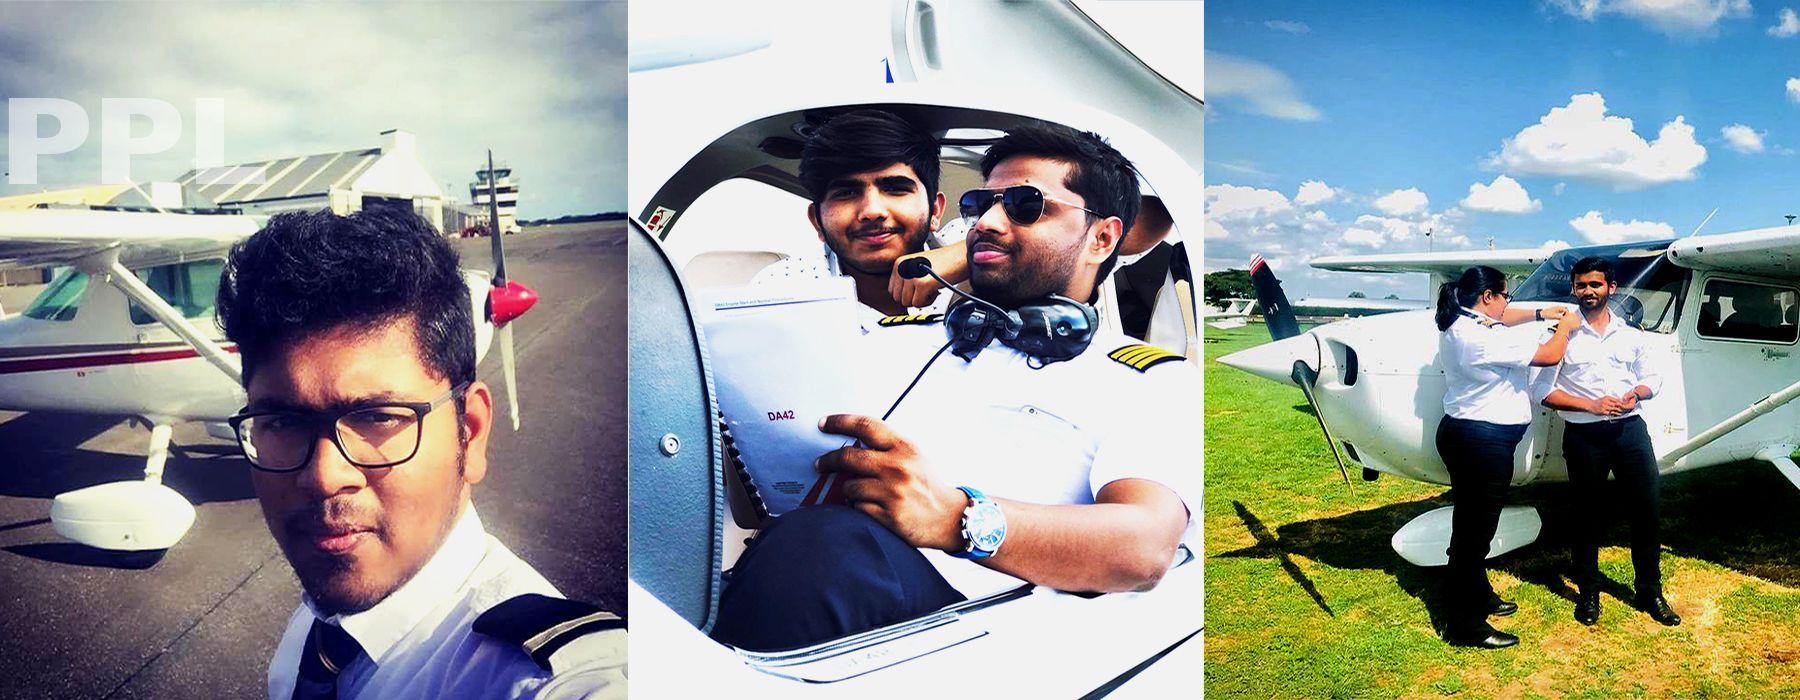 Flyuniverse is the Flight training School in Chennai. It